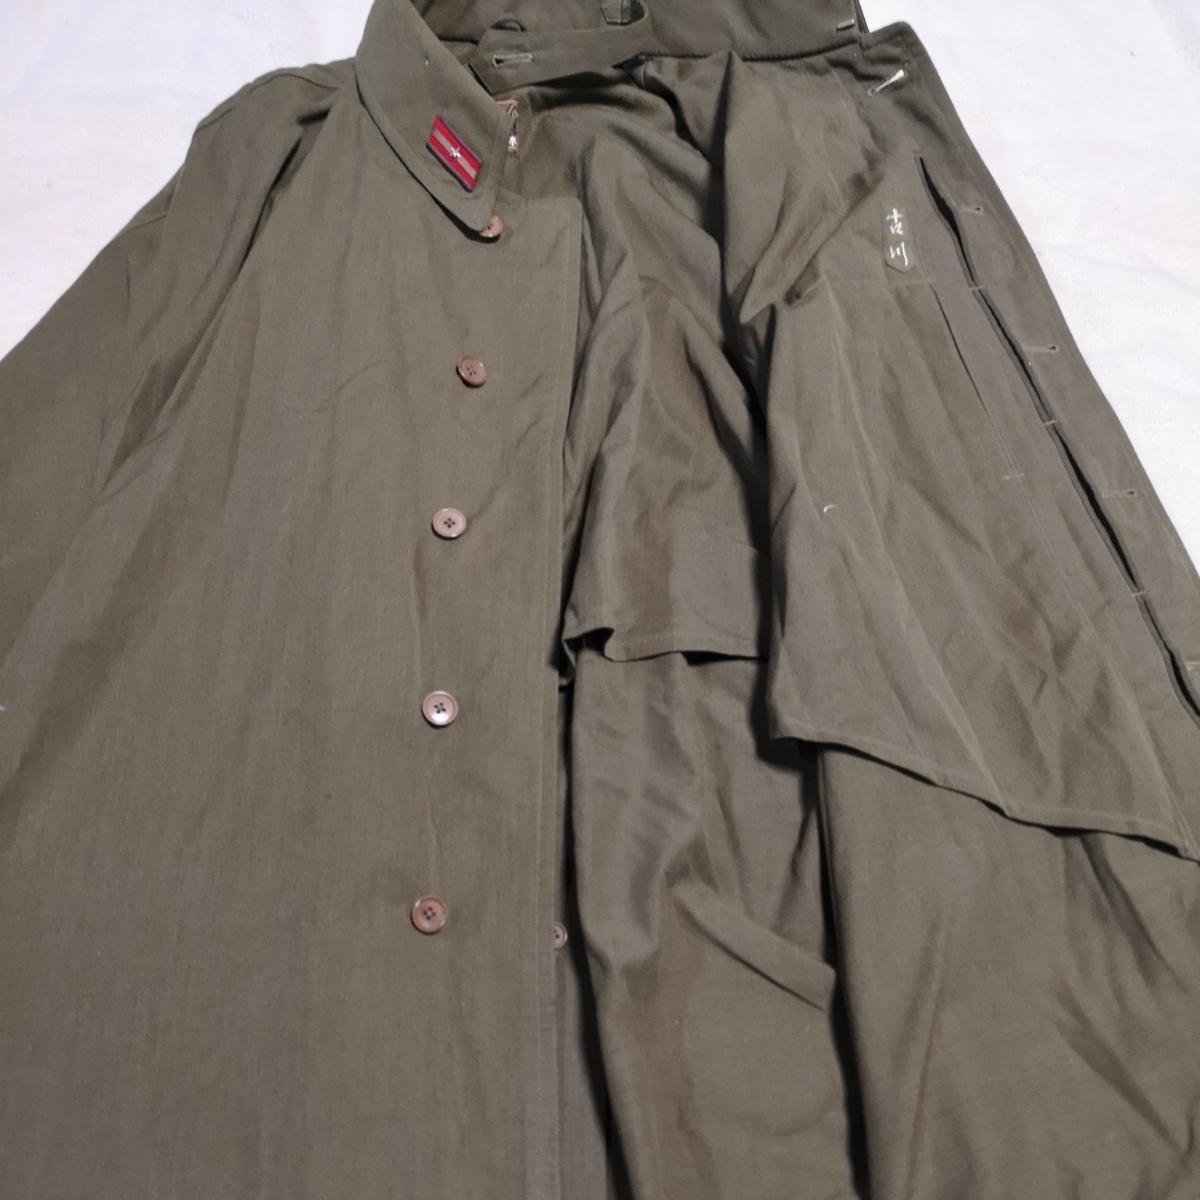 日本軍 将校マント 少尉 外套 襟章付き 戦前 洋品店仕立 軍服_画像5